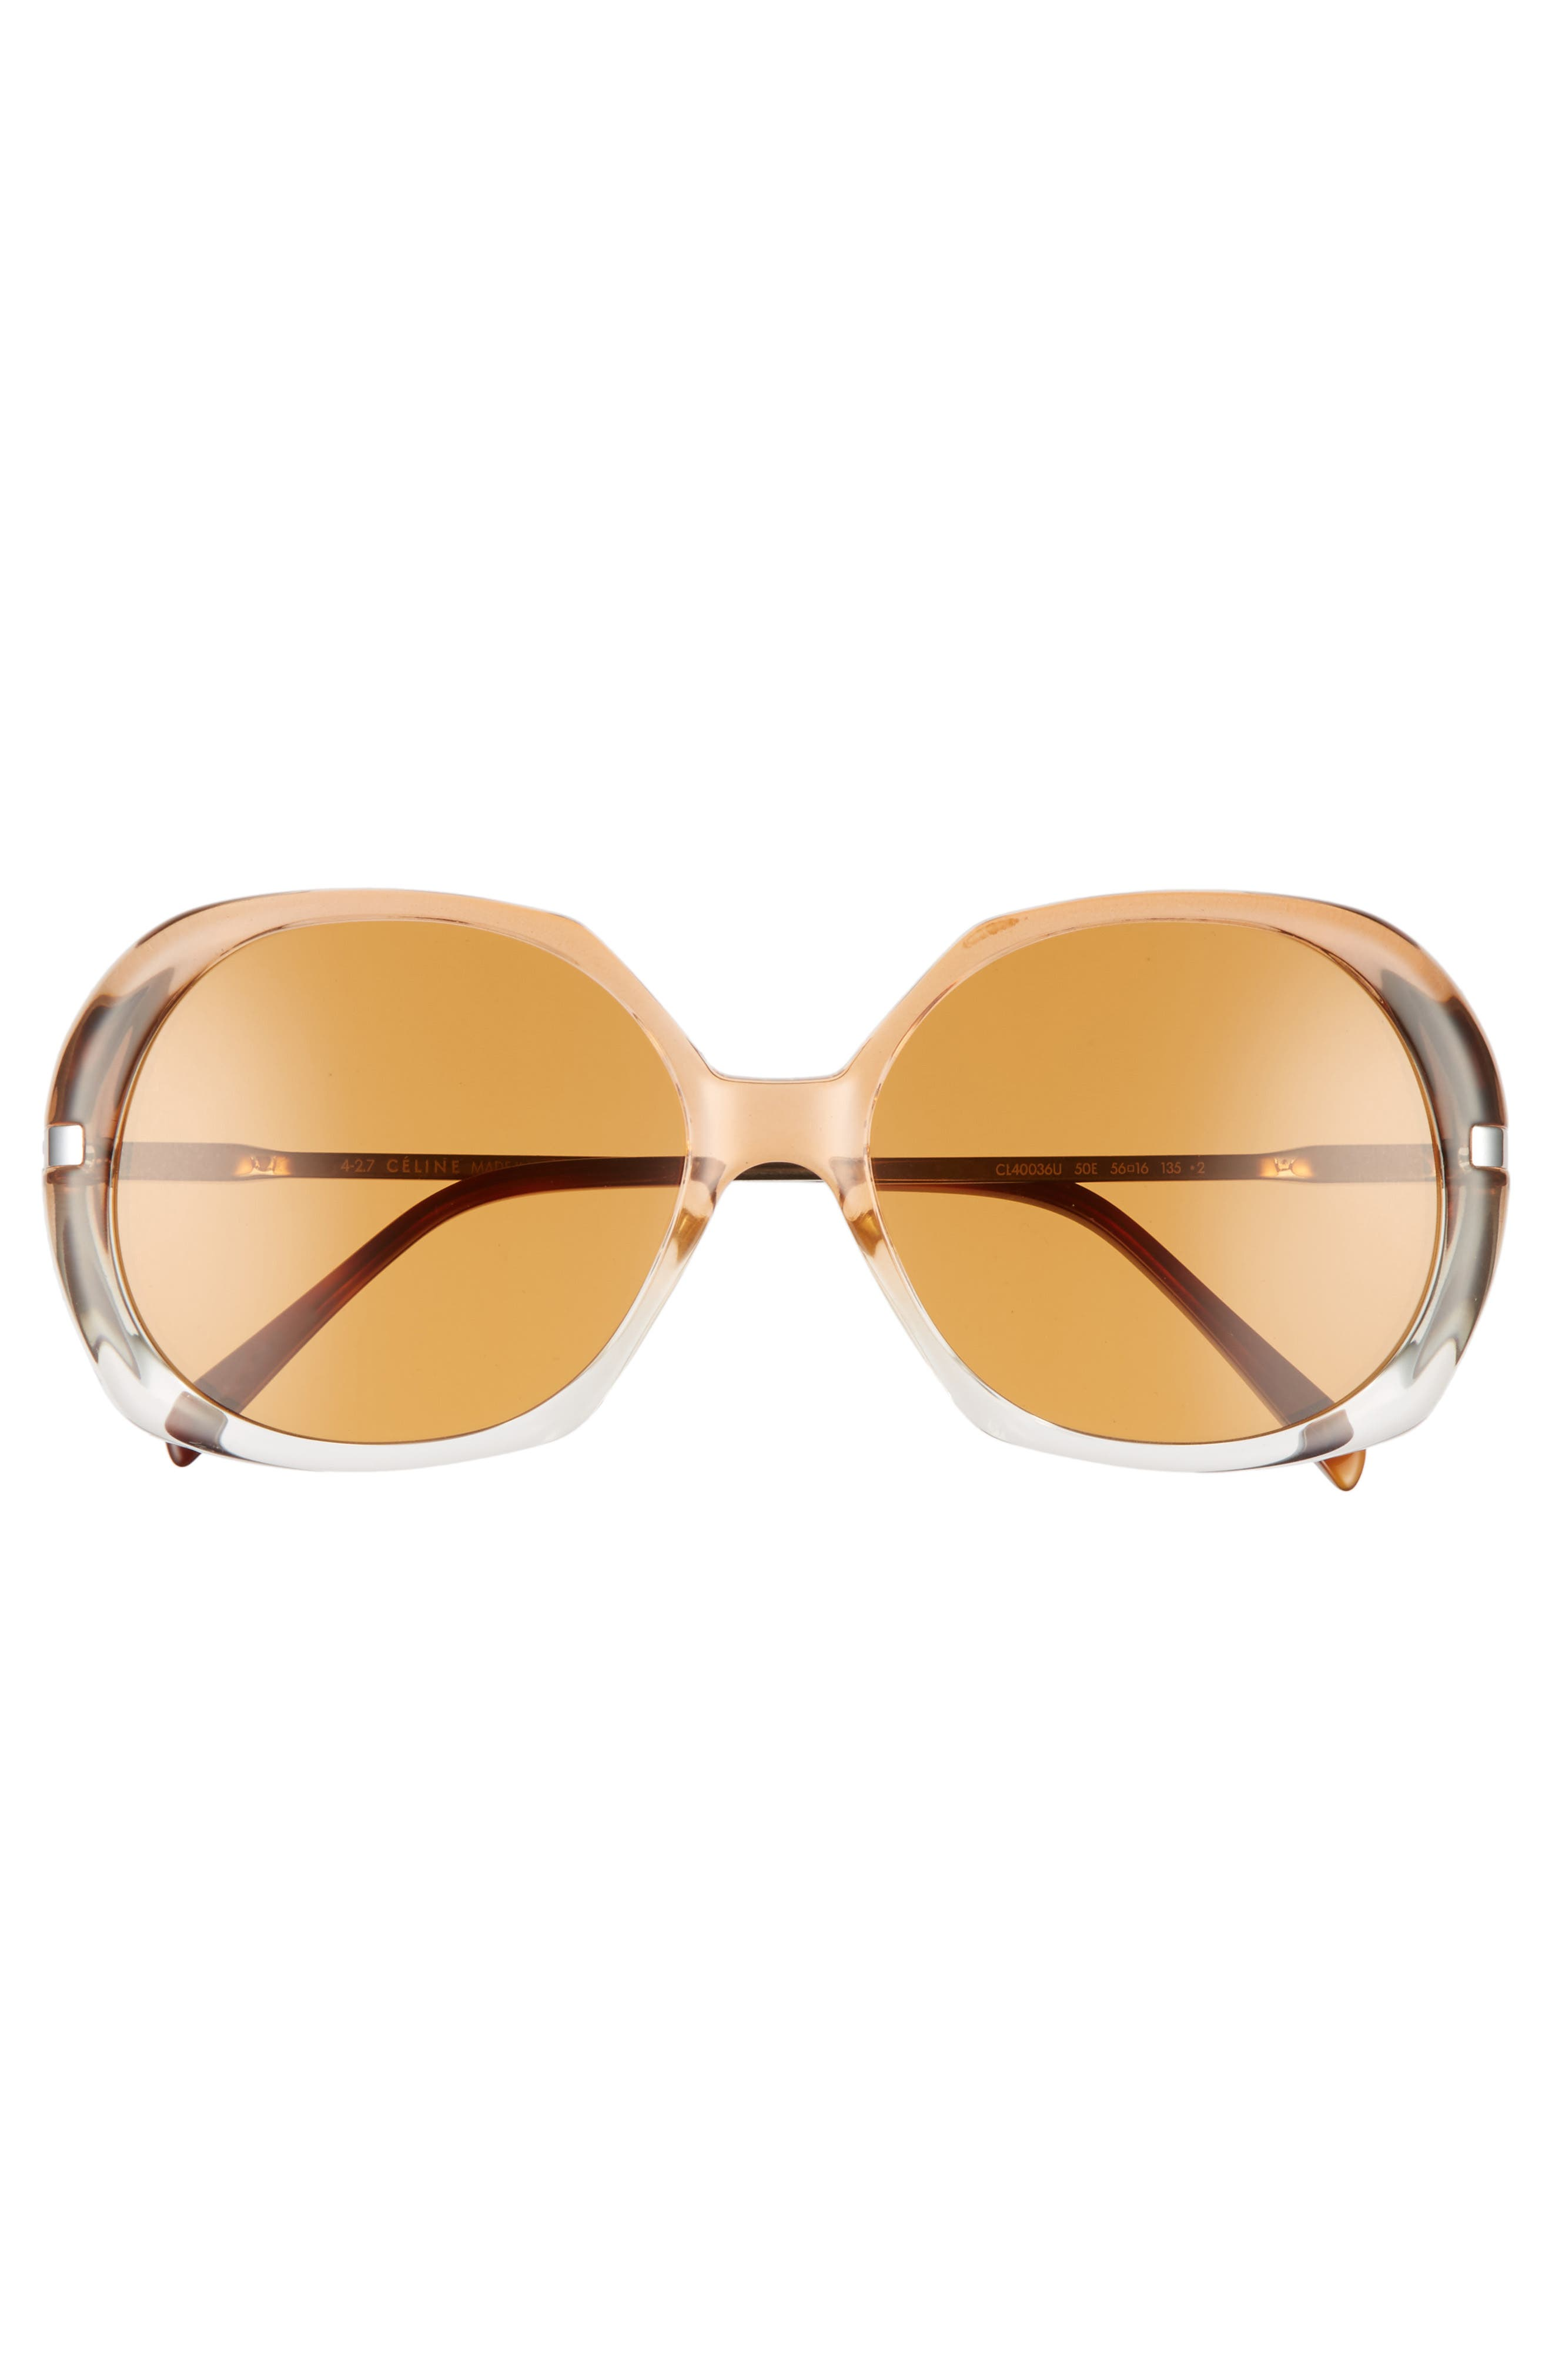 56mm Round Sunglasses,                             Alternate thumbnail 3, color,                             200